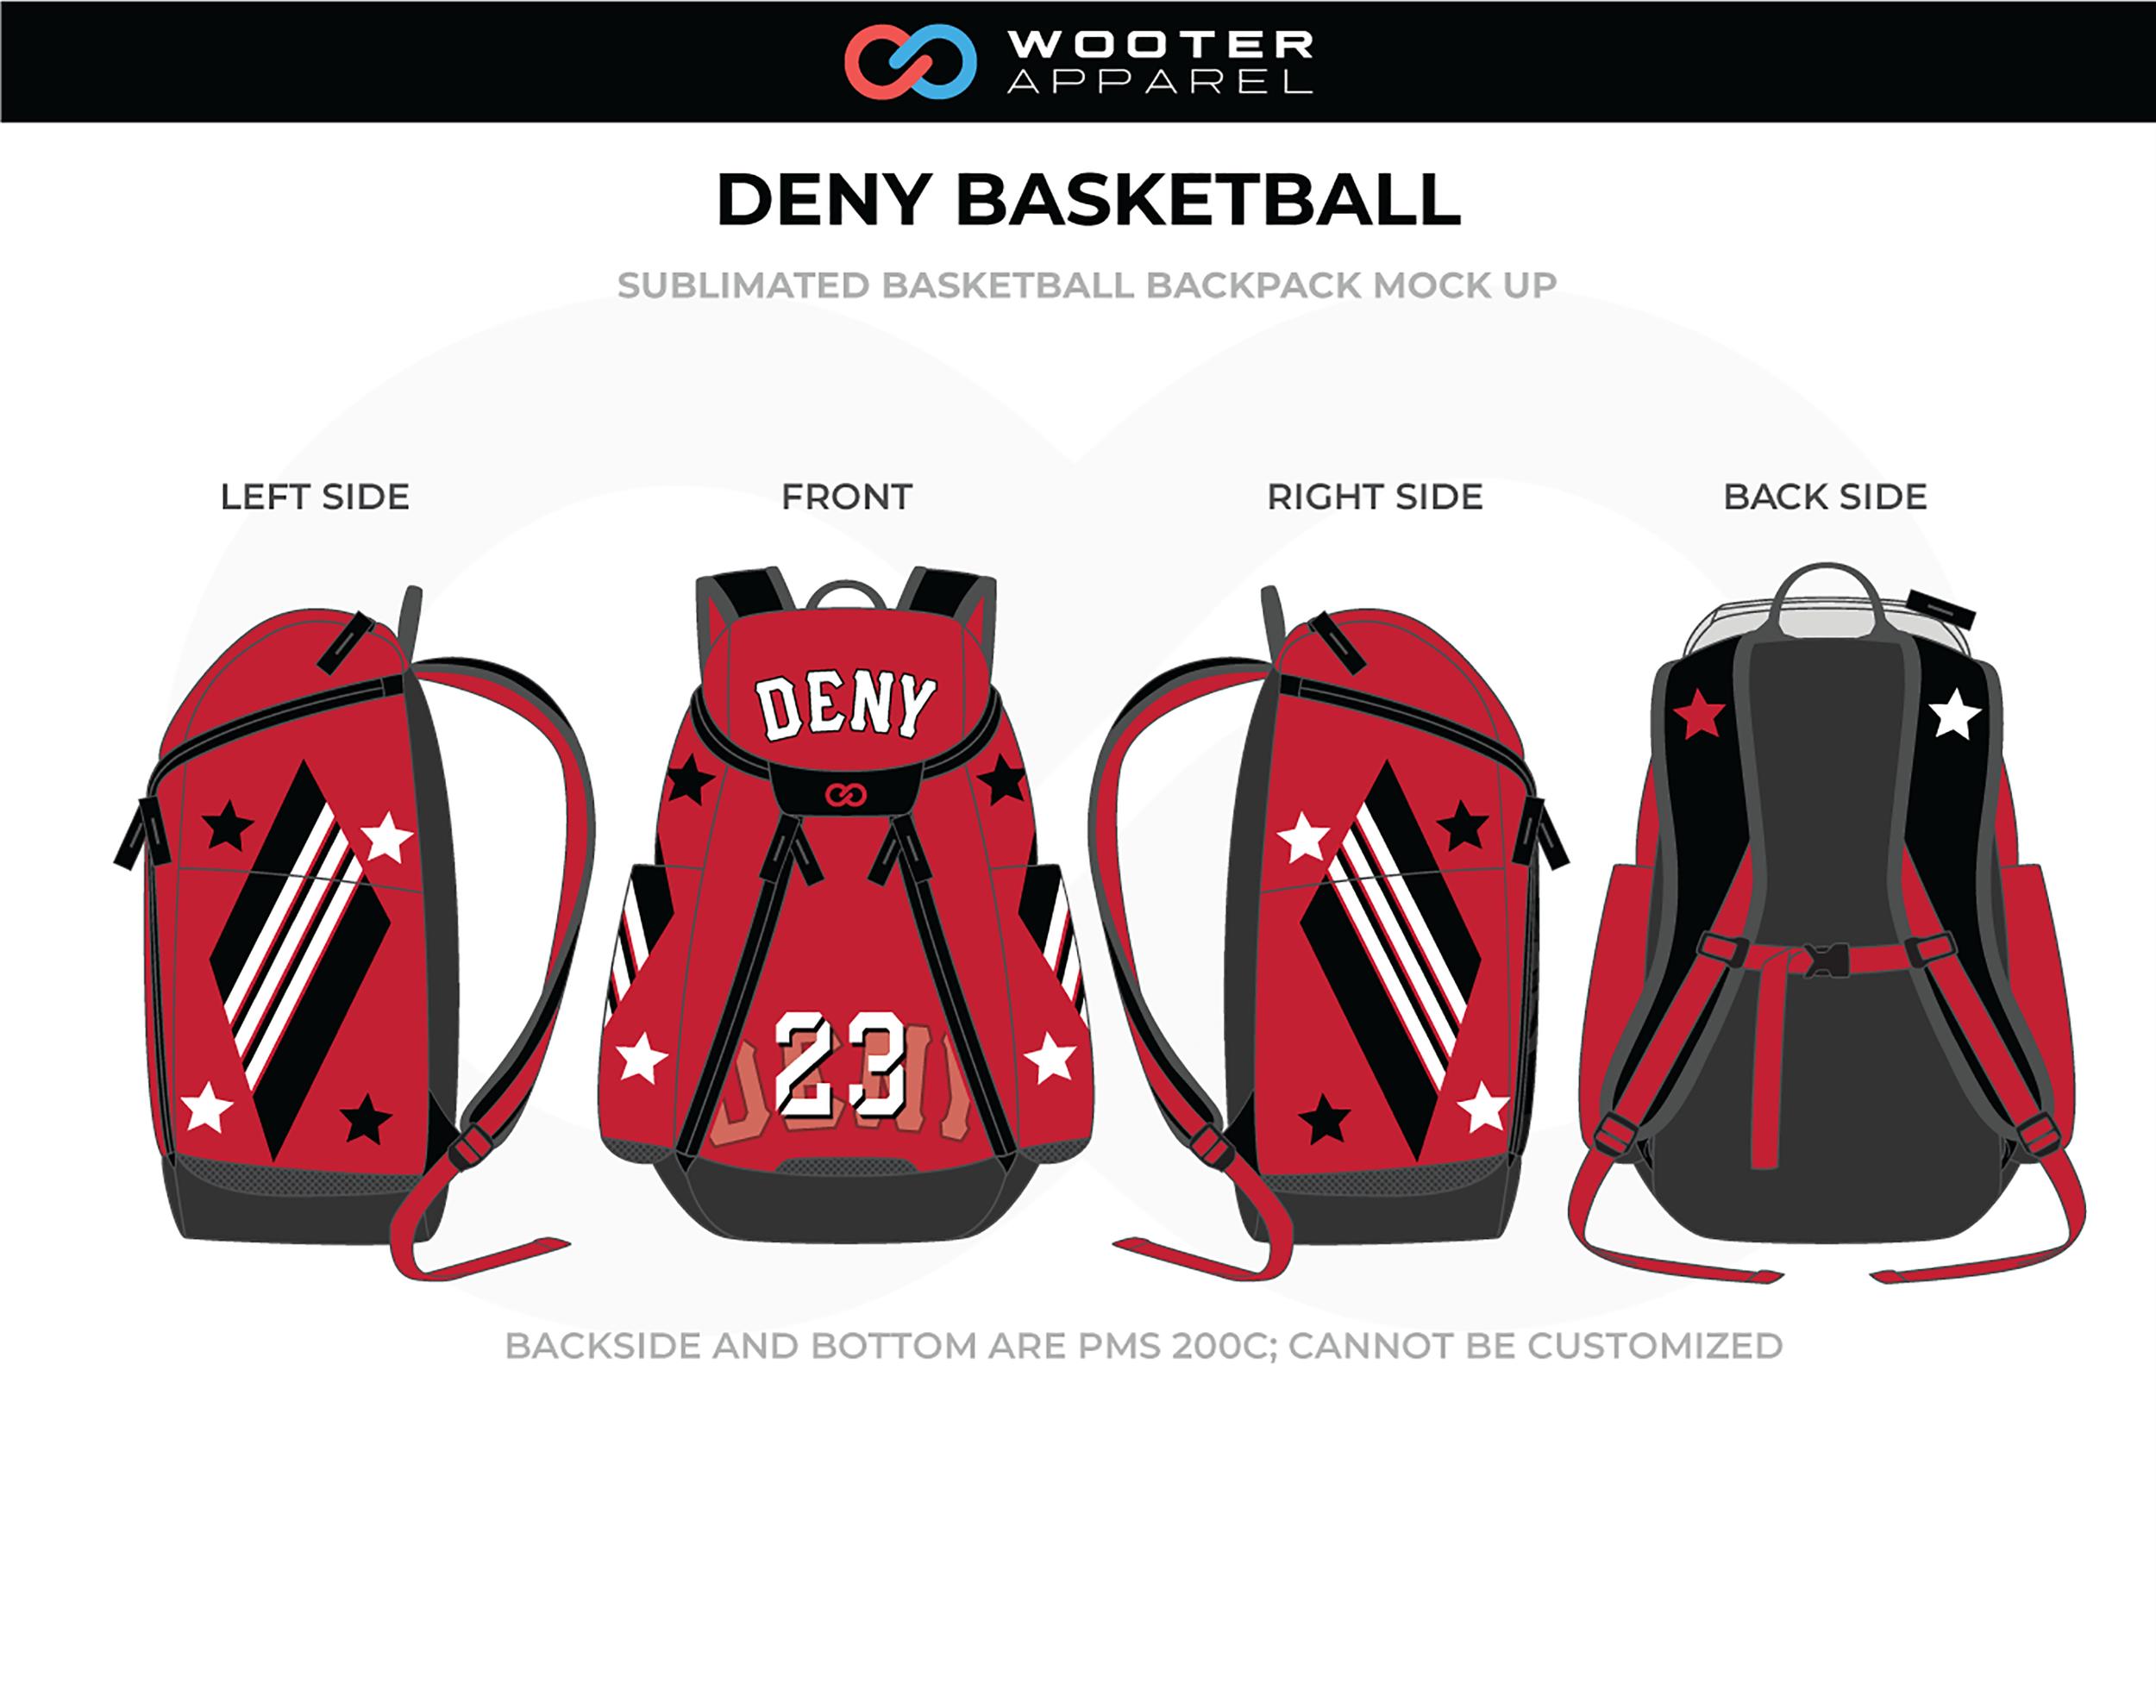 DenyBasketball_BackpackMockupV3.png